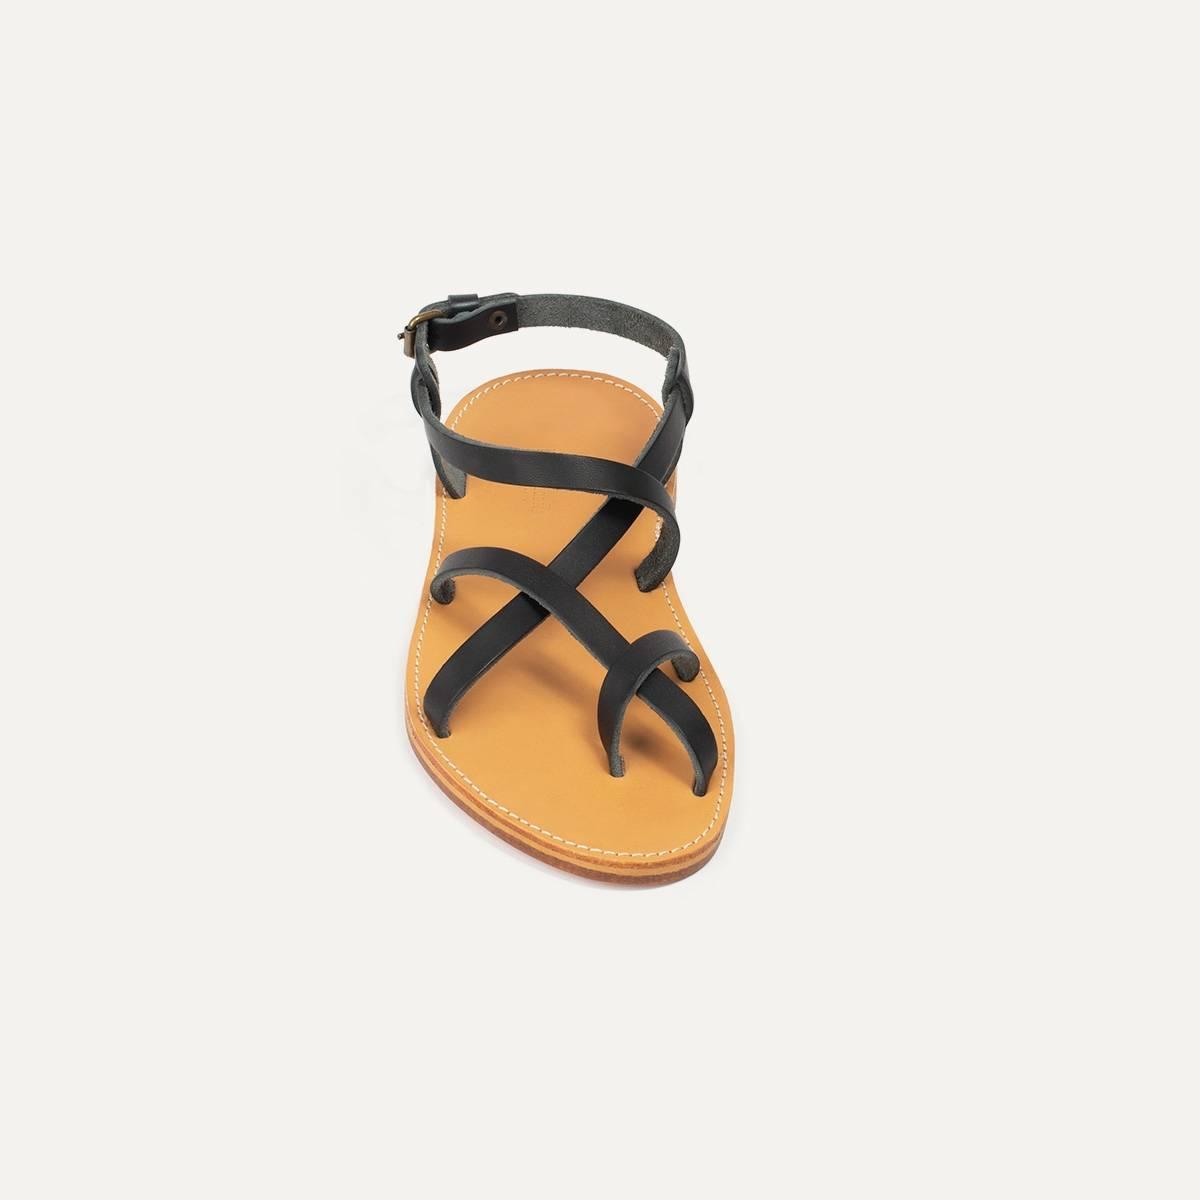 Nara leather sandals - Black (image n°3)